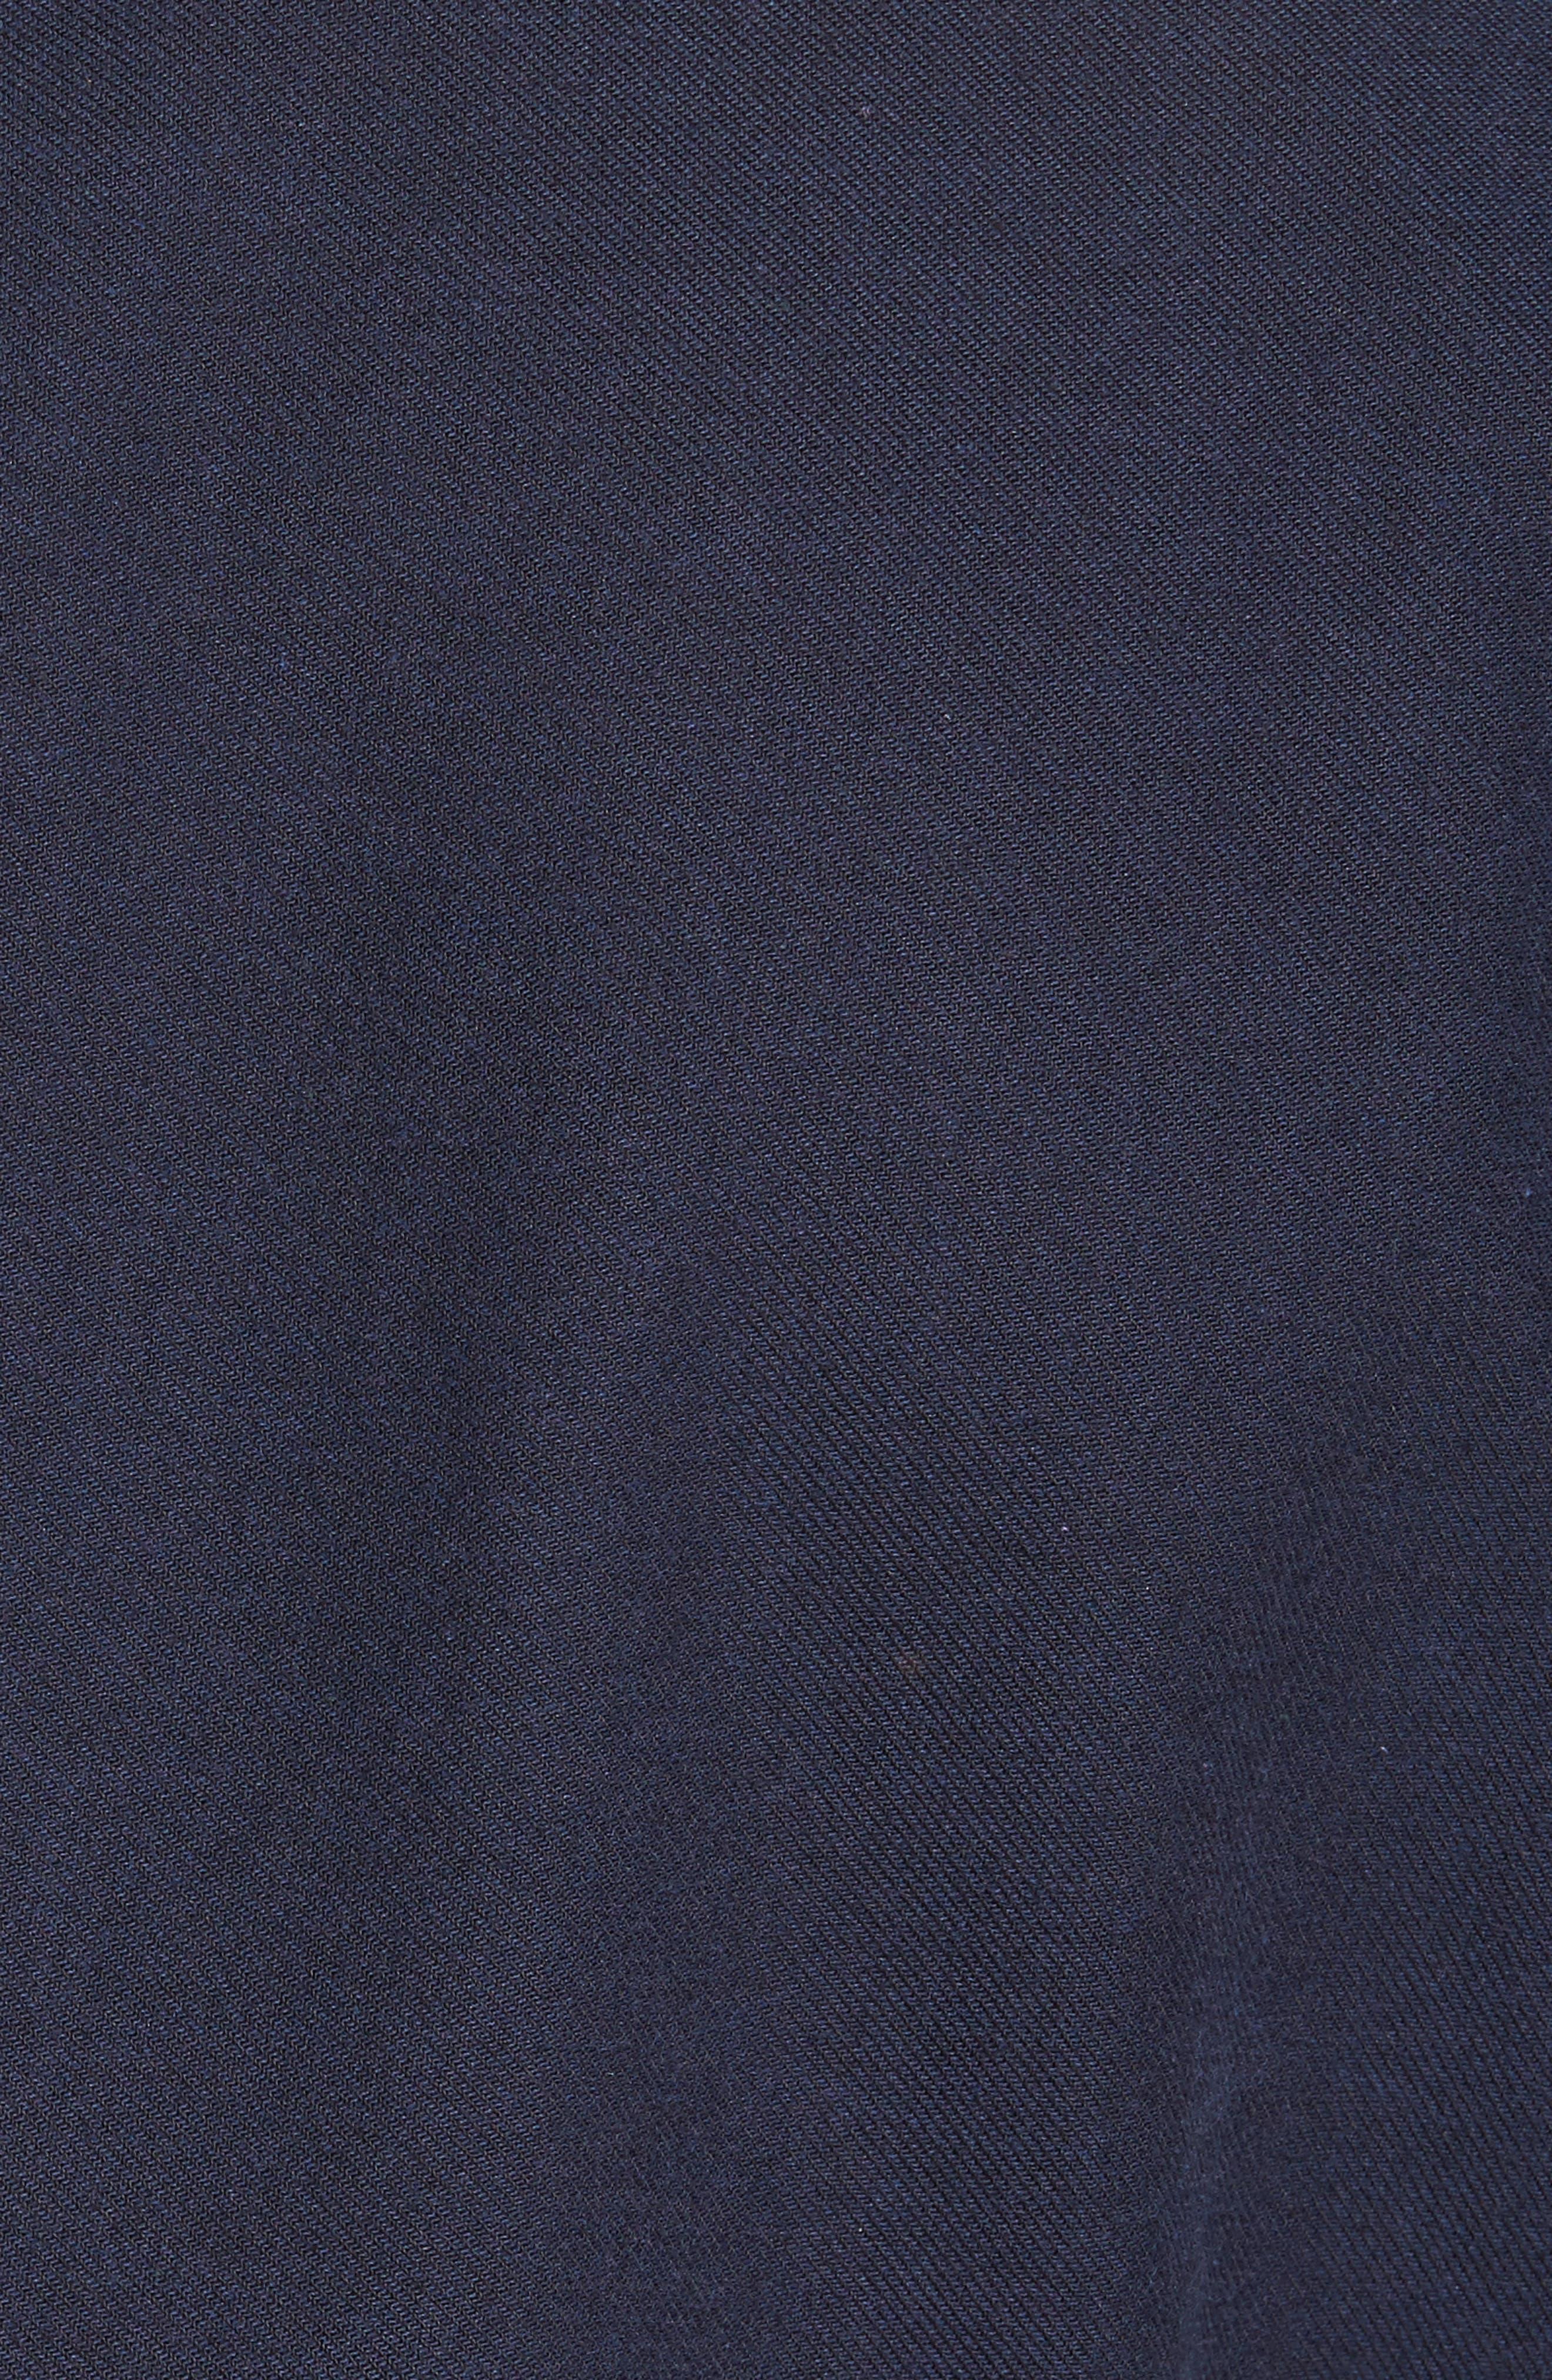 Pembroke Sports Fit Twill Jacket,                             Alternate thumbnail 6, color,                             410